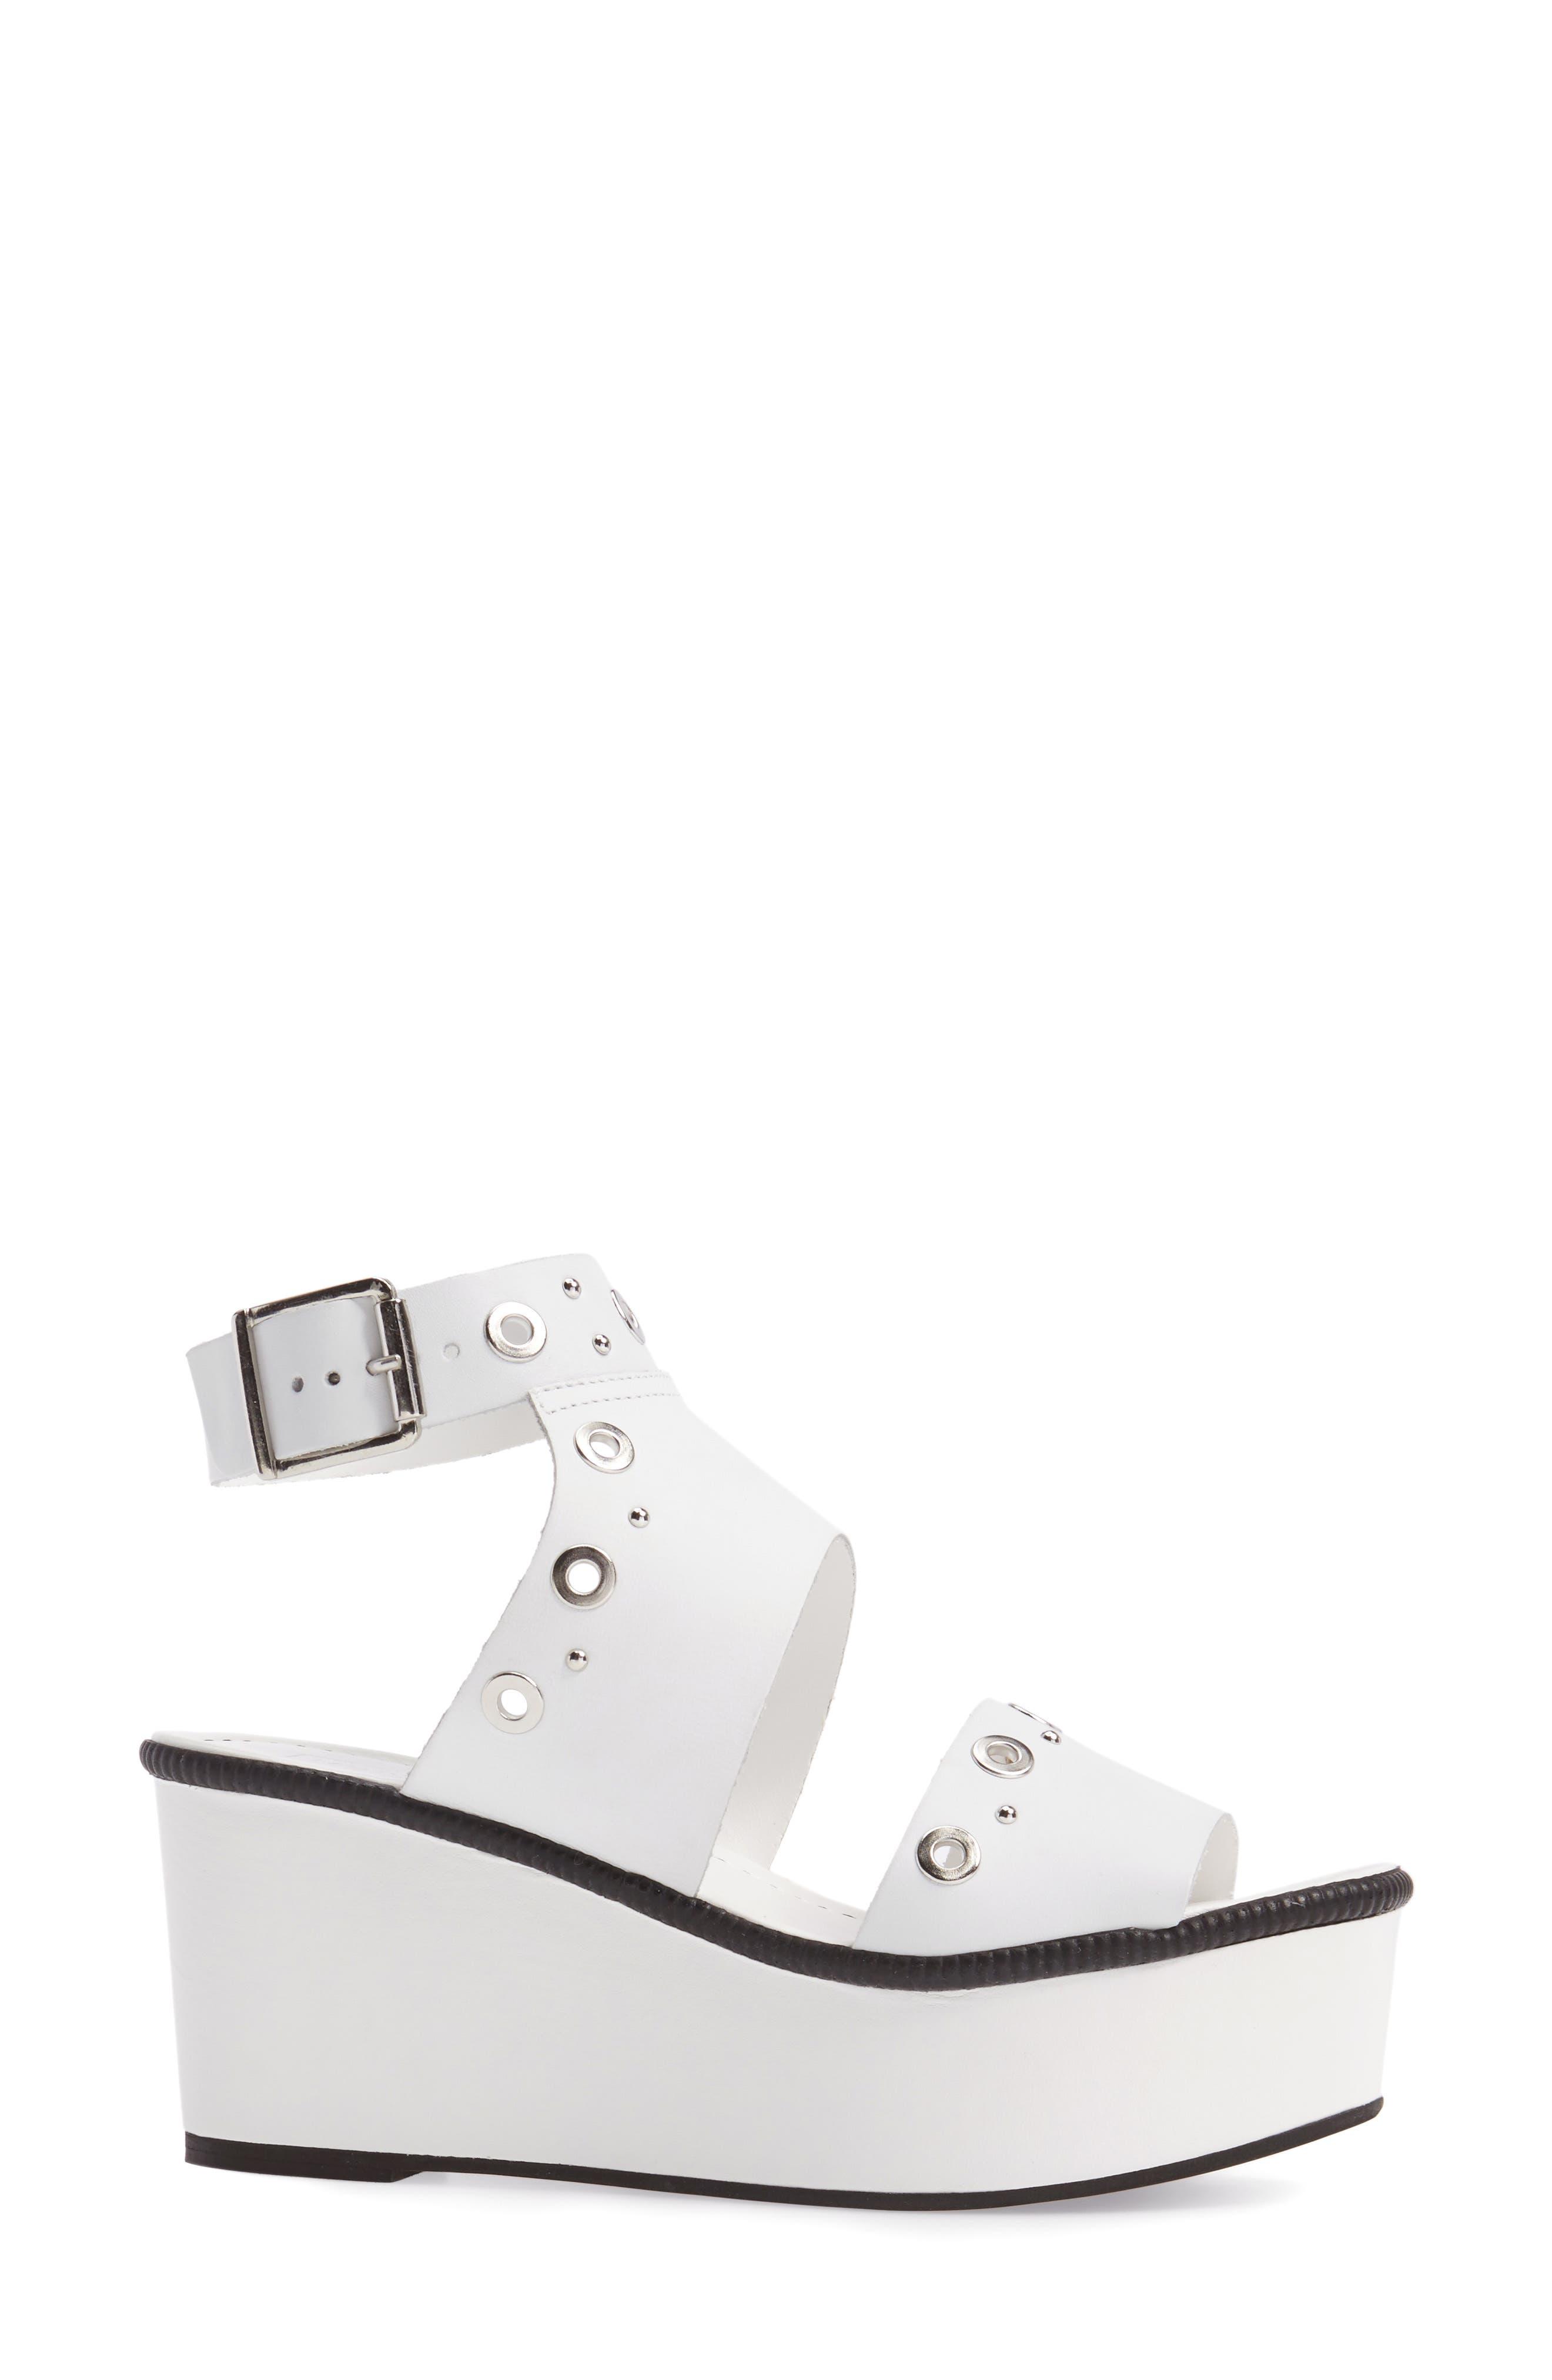 Wizz Grommeted Platform Wedge Sandal,                             Alternate thumbnail 6, color,